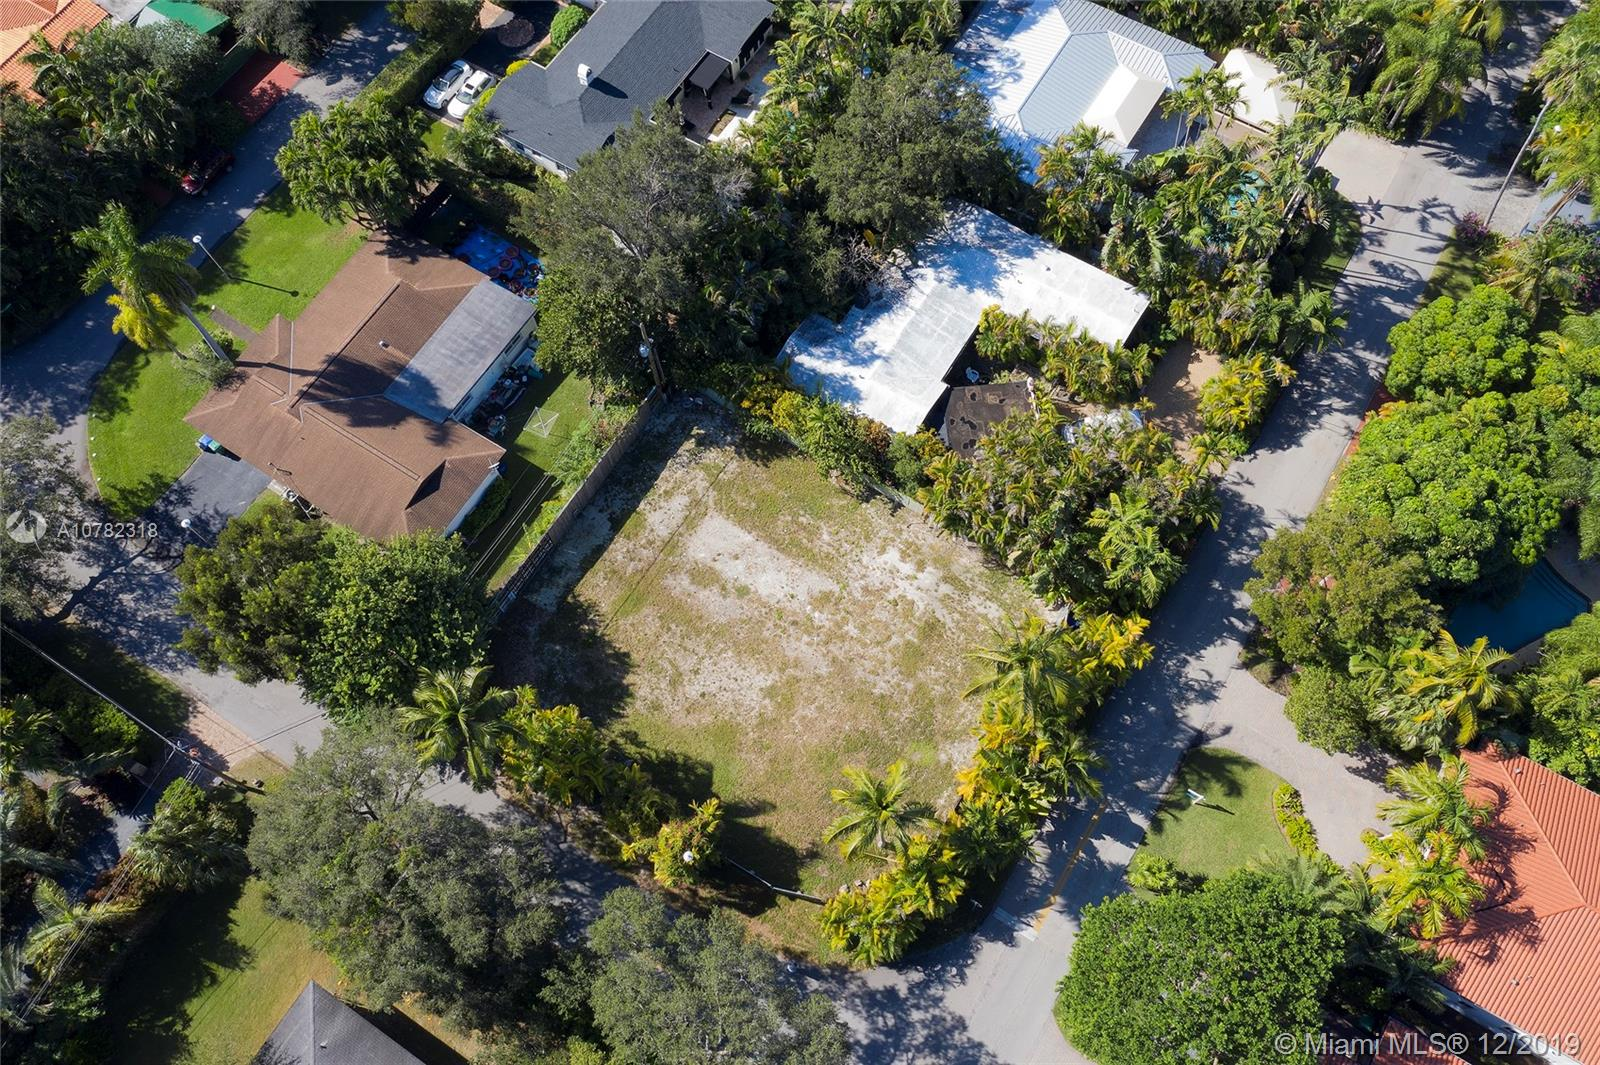 3800 Crawford Ave, Coral Gables, Florida